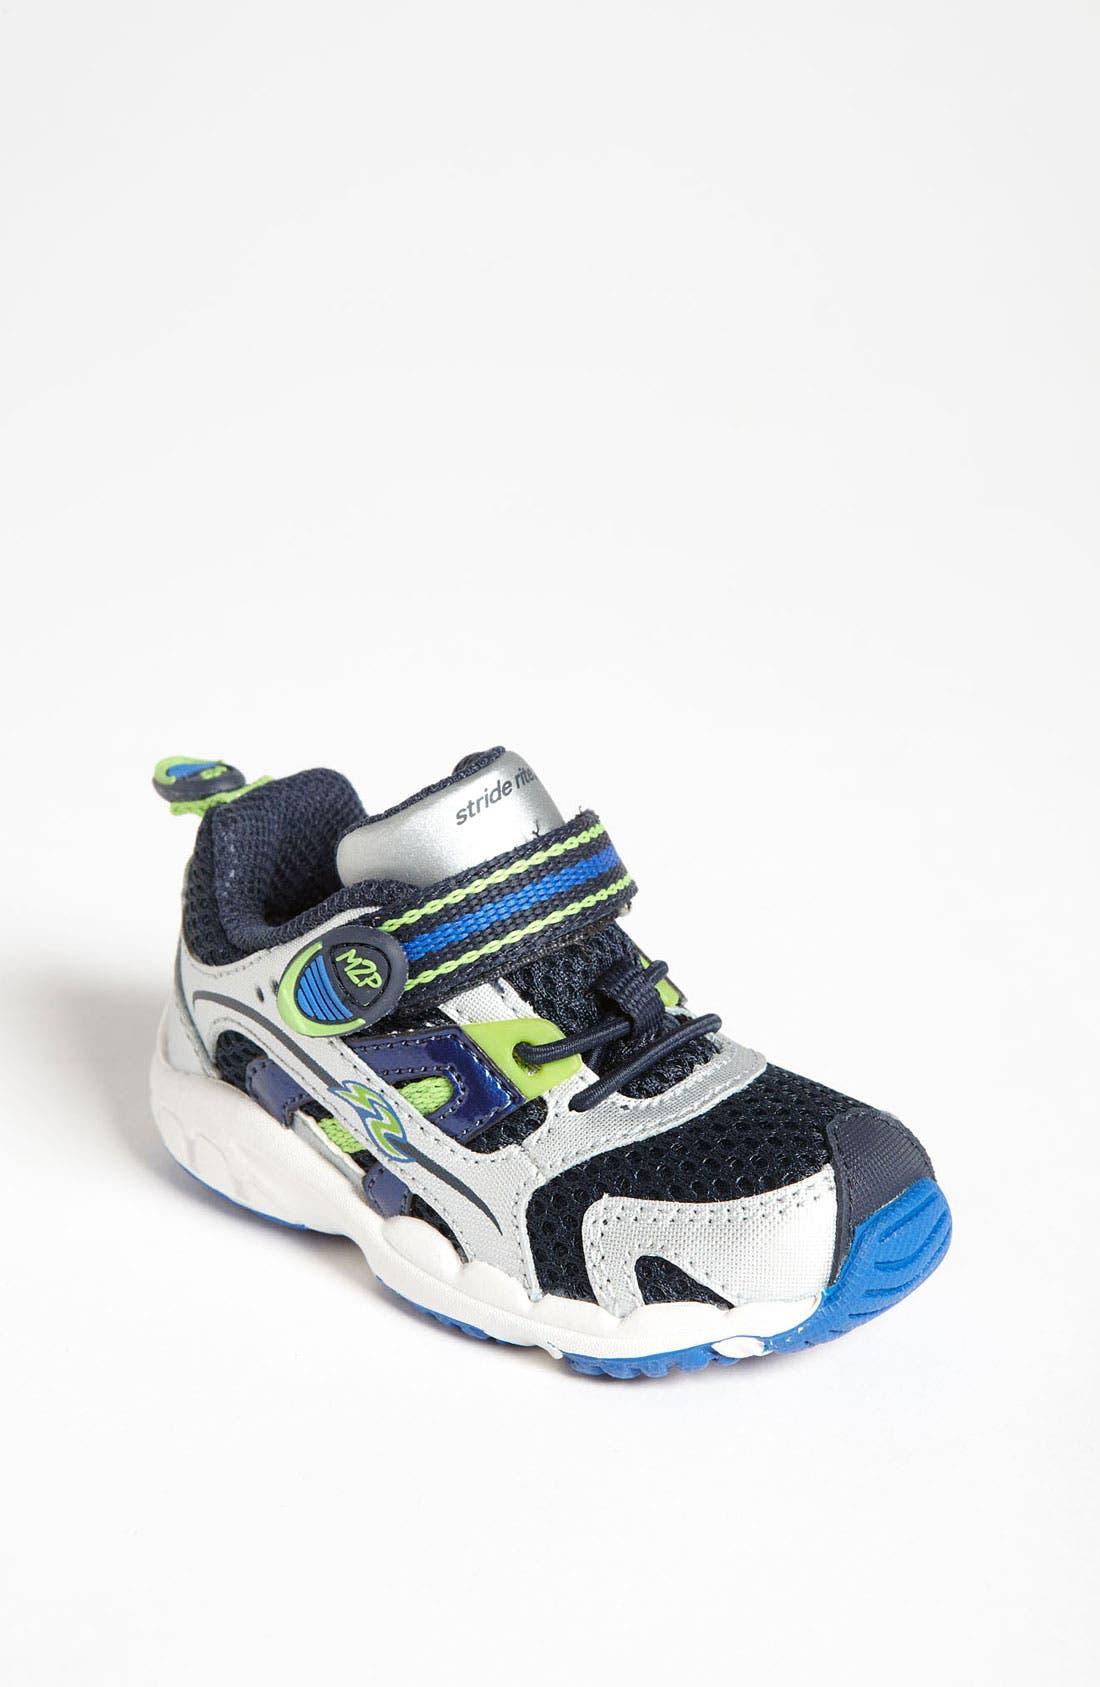 Main Image - Stride Rite 'Baby Thorpe' Sneaker (Baby, Walker & Toddler)